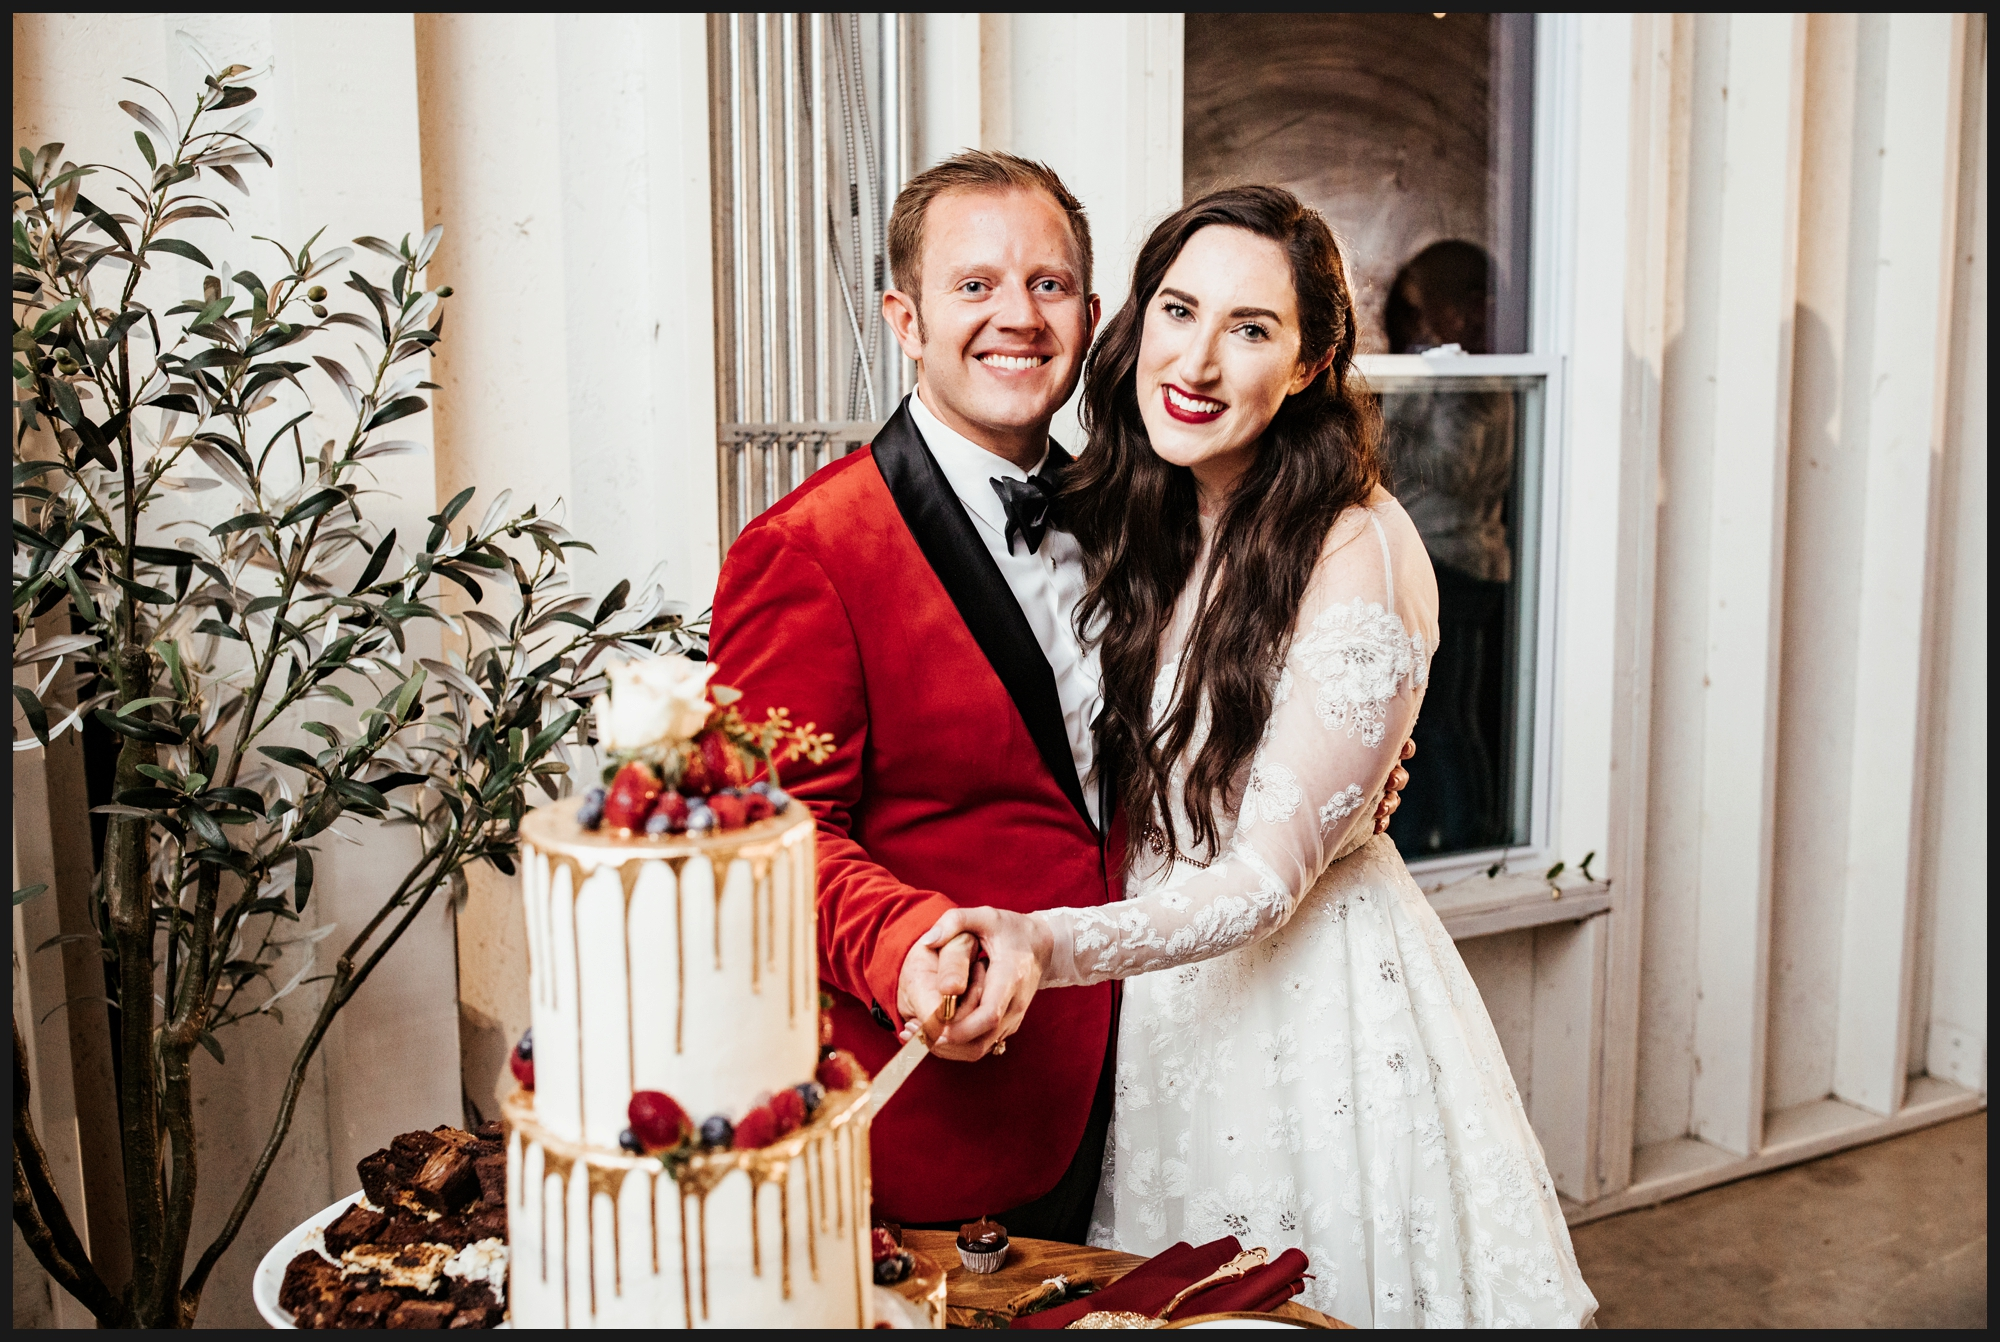 Orlando-Wedding-Photographer-destination-wedding-photographer-florida-wedding-photographer-hawaii-wedding-photographer_0545.jpg